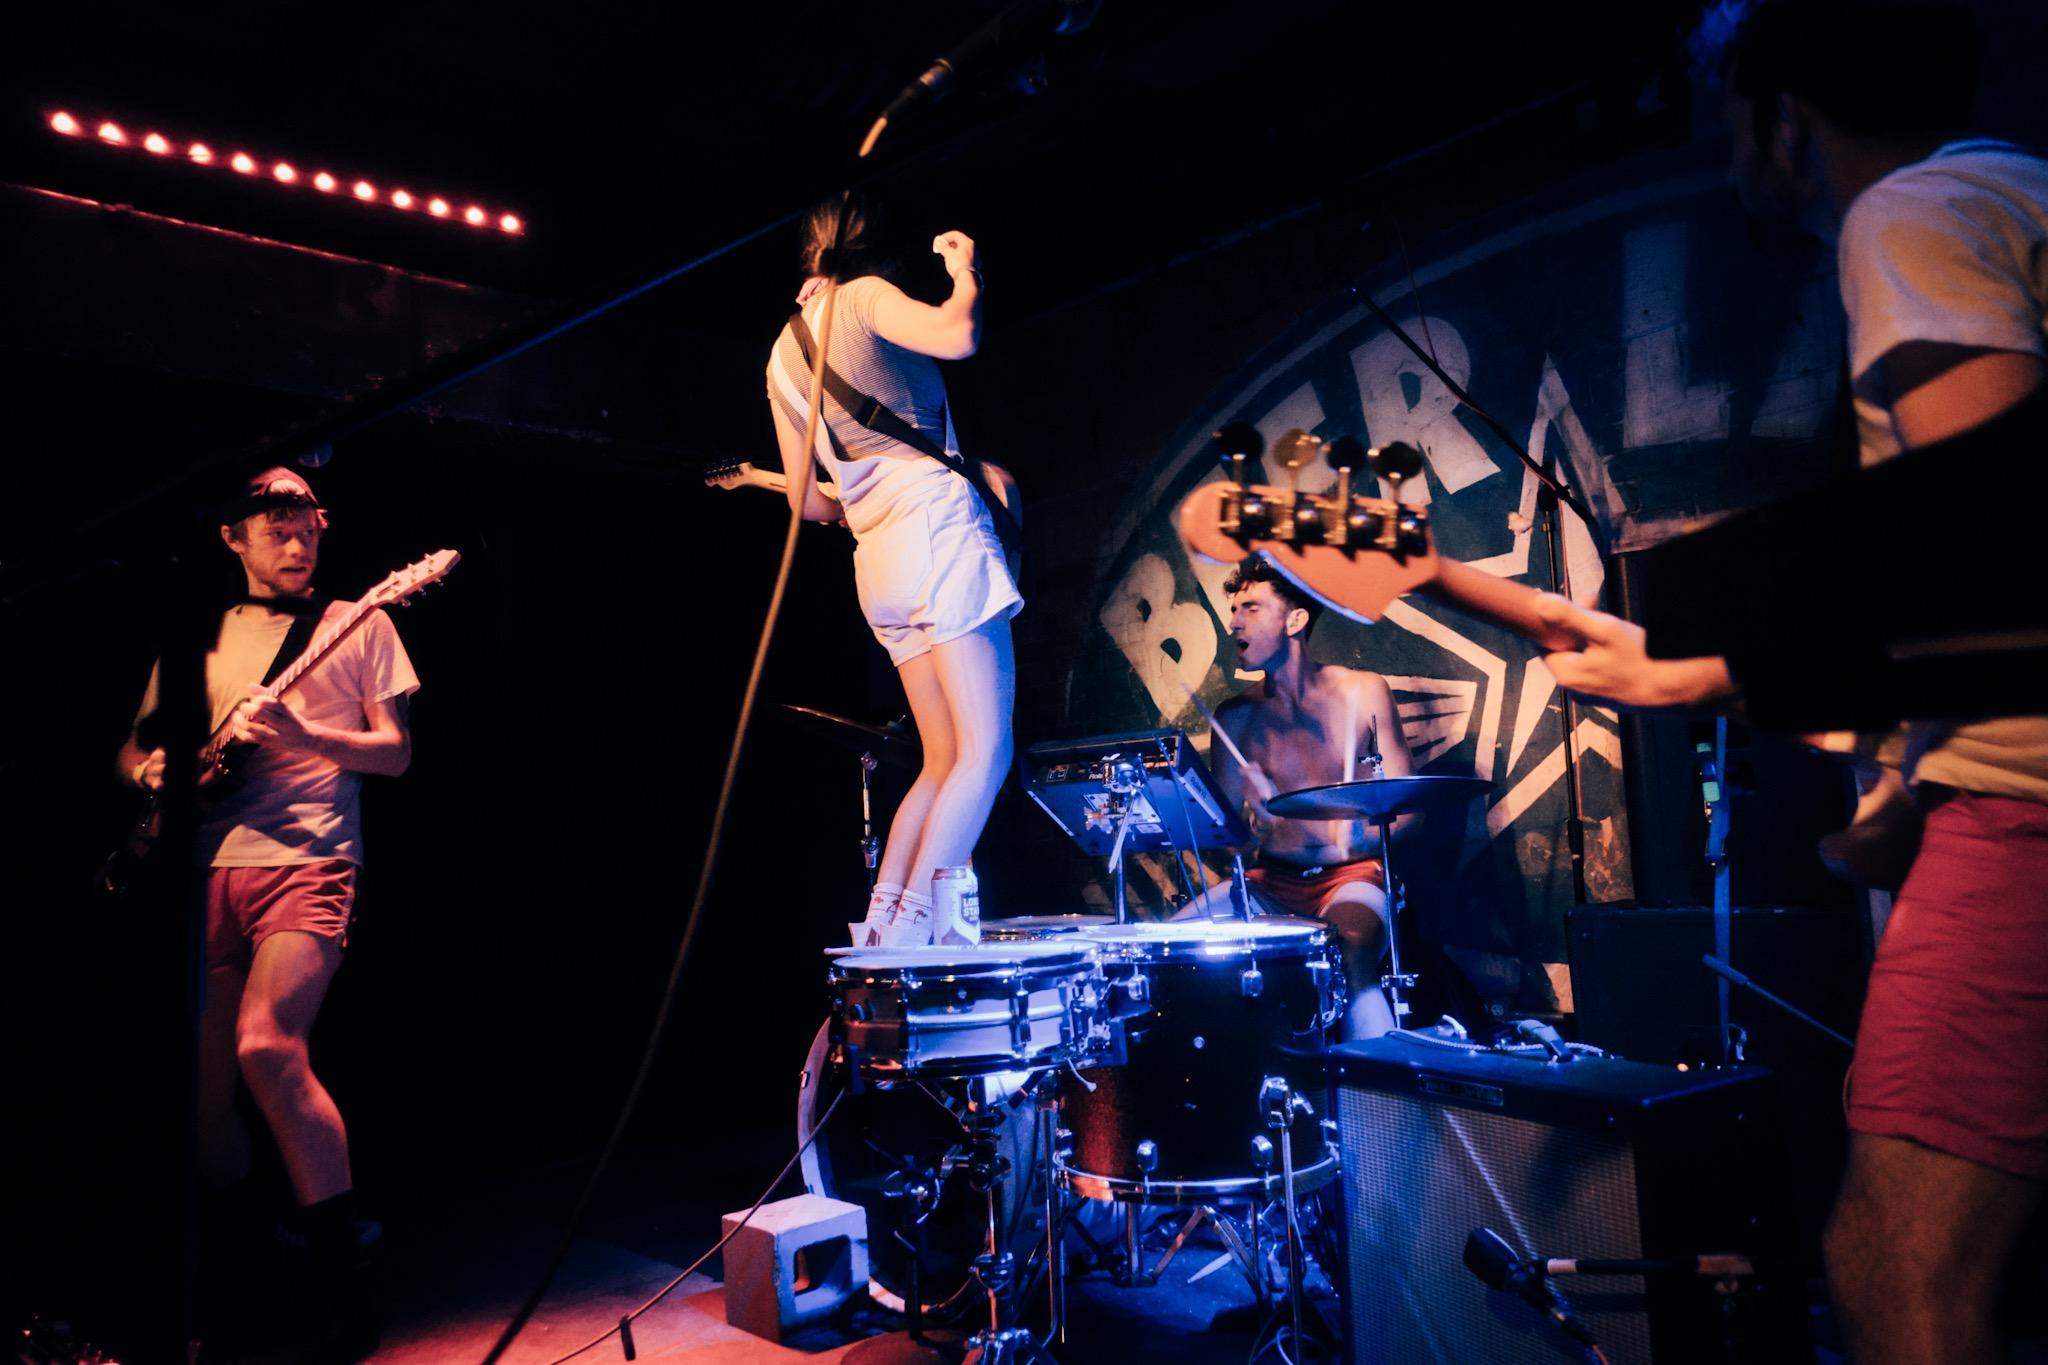 ADI – Illuminati Hotties, indie rock underground gainditzalea